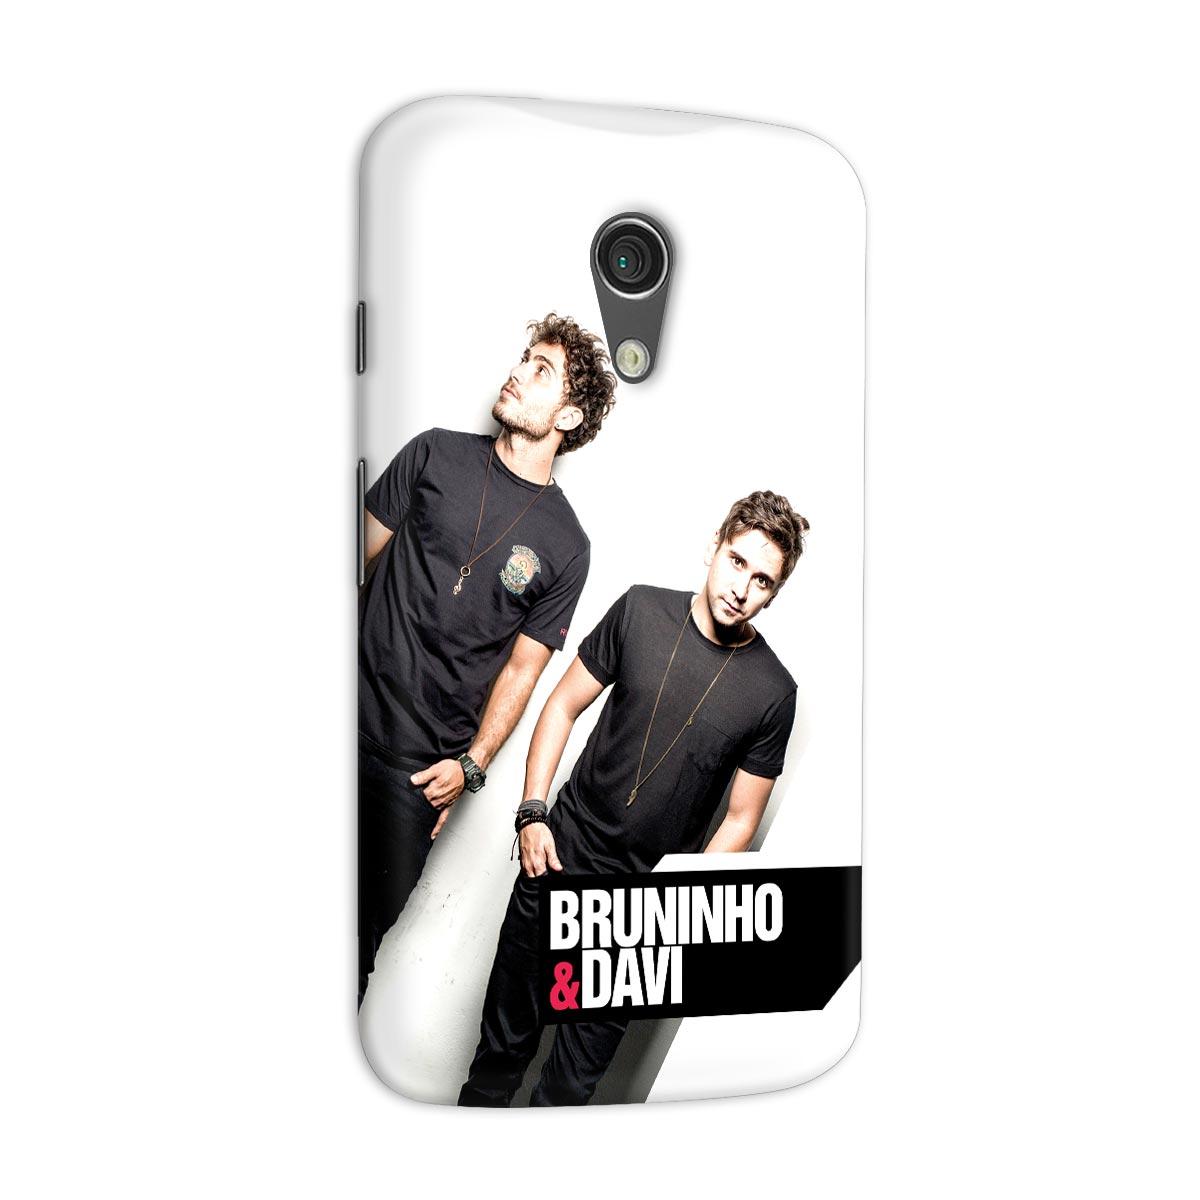 Capa para Motorola Moto G 2 Bruninho & Davi Foto